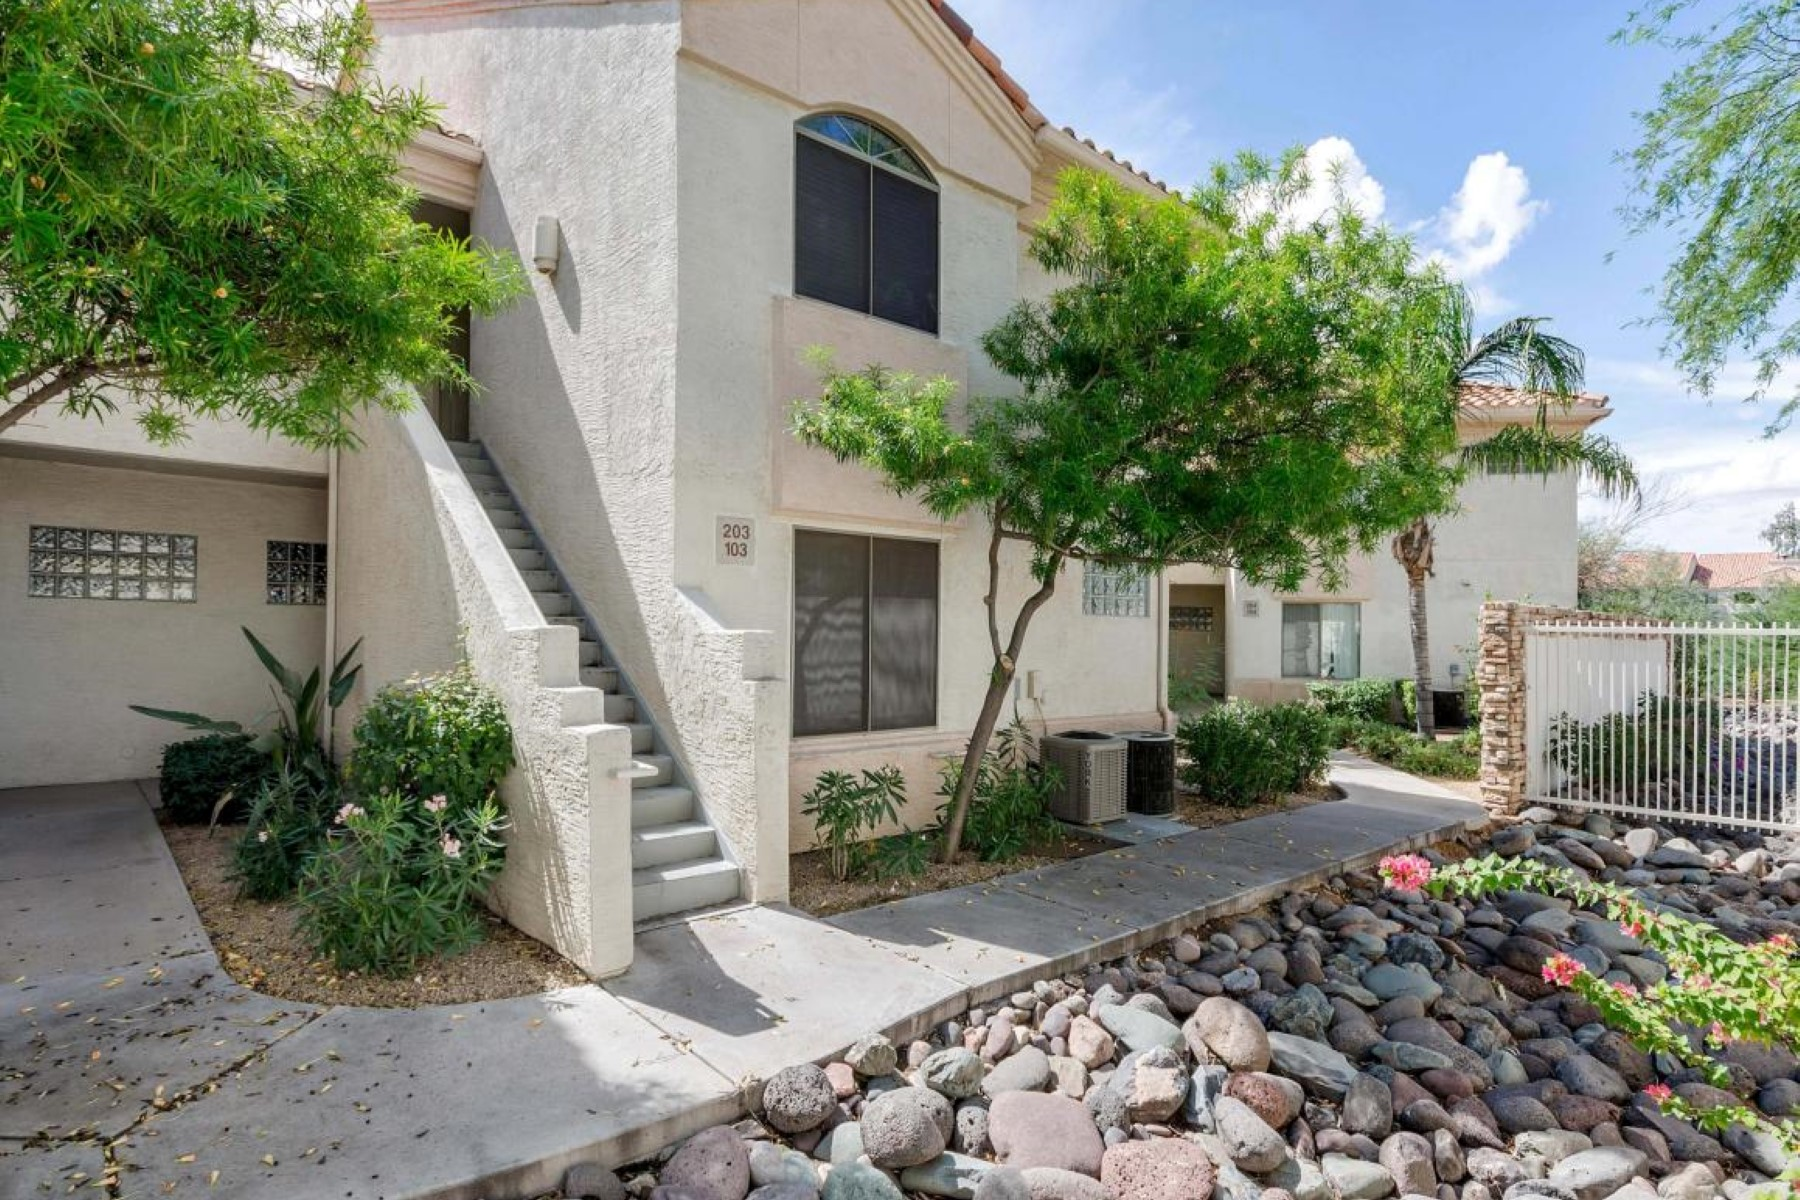 Stadthaus für Verkauf beim Beautifully maintained and perfectly located Townhouse 5249 E Shea BLVD 103 Scottsdale, Arizona 85254 Vereinigte Staaten